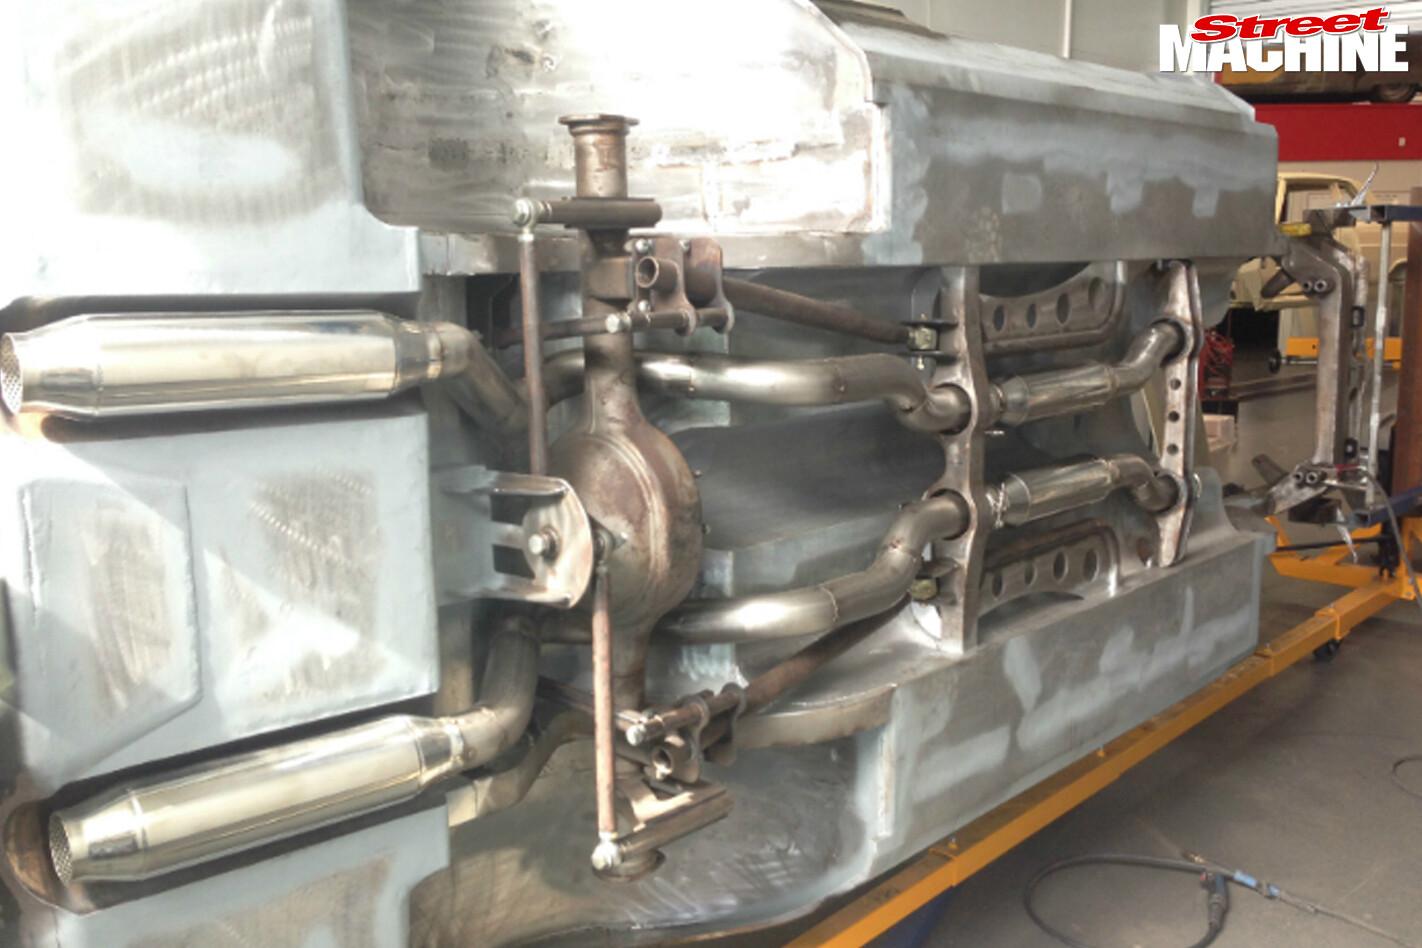 Camaro -underside -2